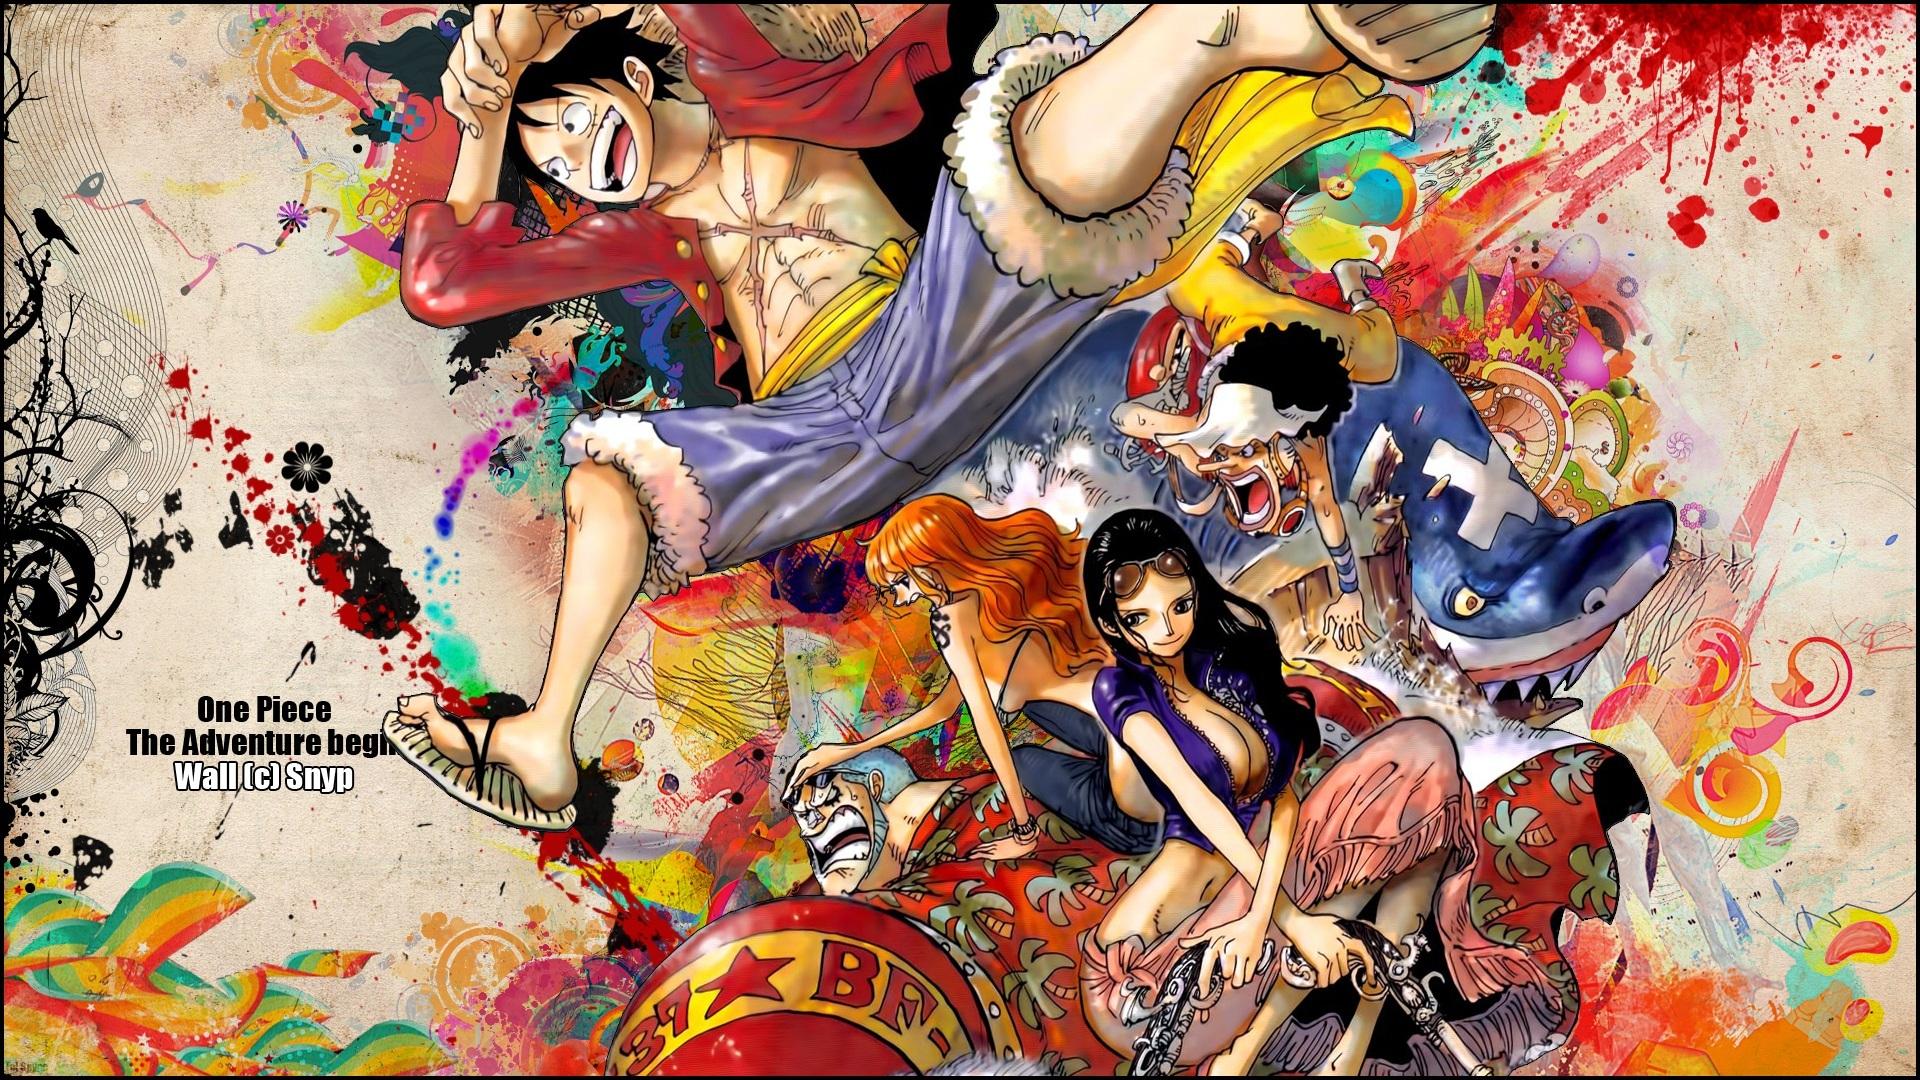 Free Download Fond Ecran Hd Manga One Piece Wallpaper